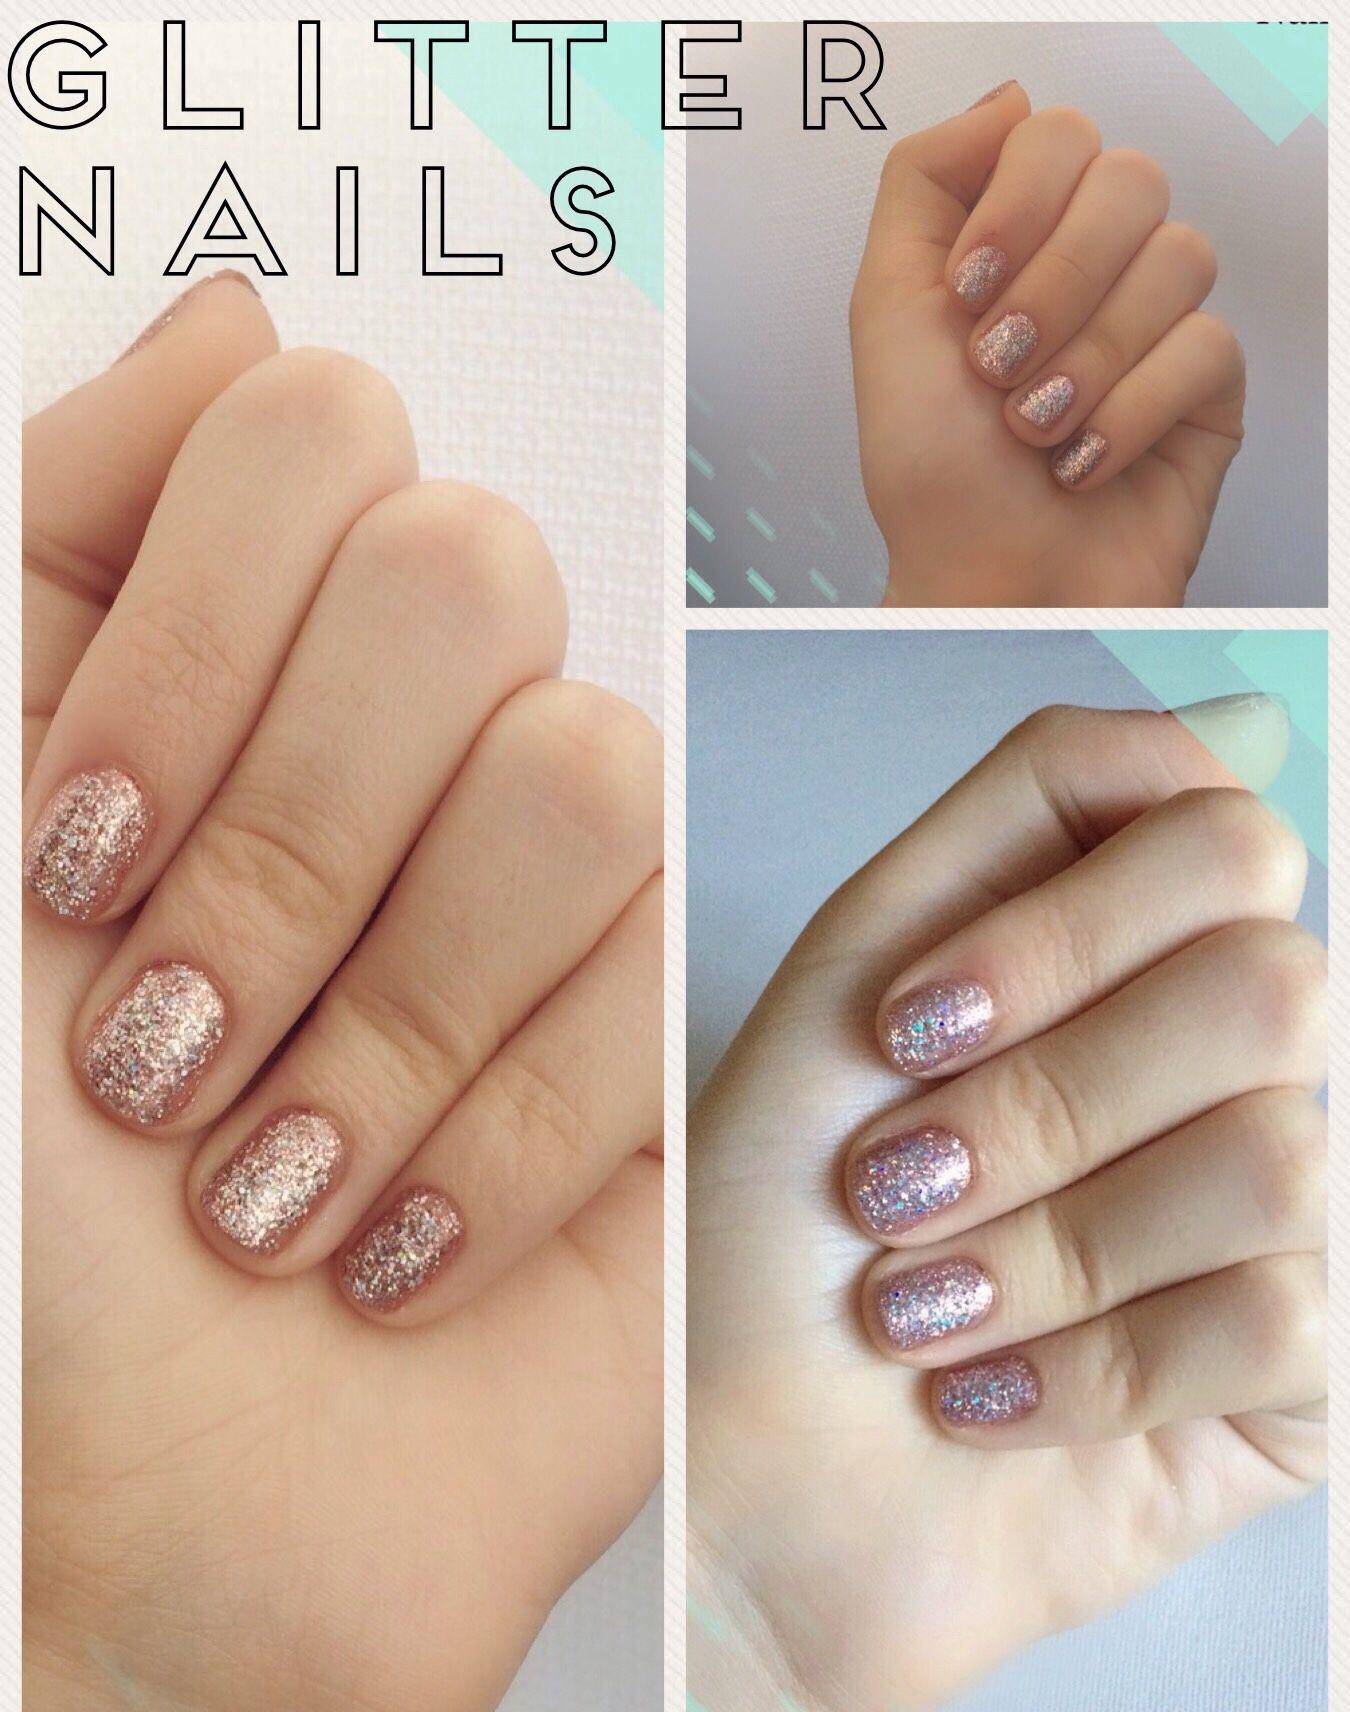 Nails Polishes I used: Sally Hansen Hard as Nails Xtreme Wear #200 ...